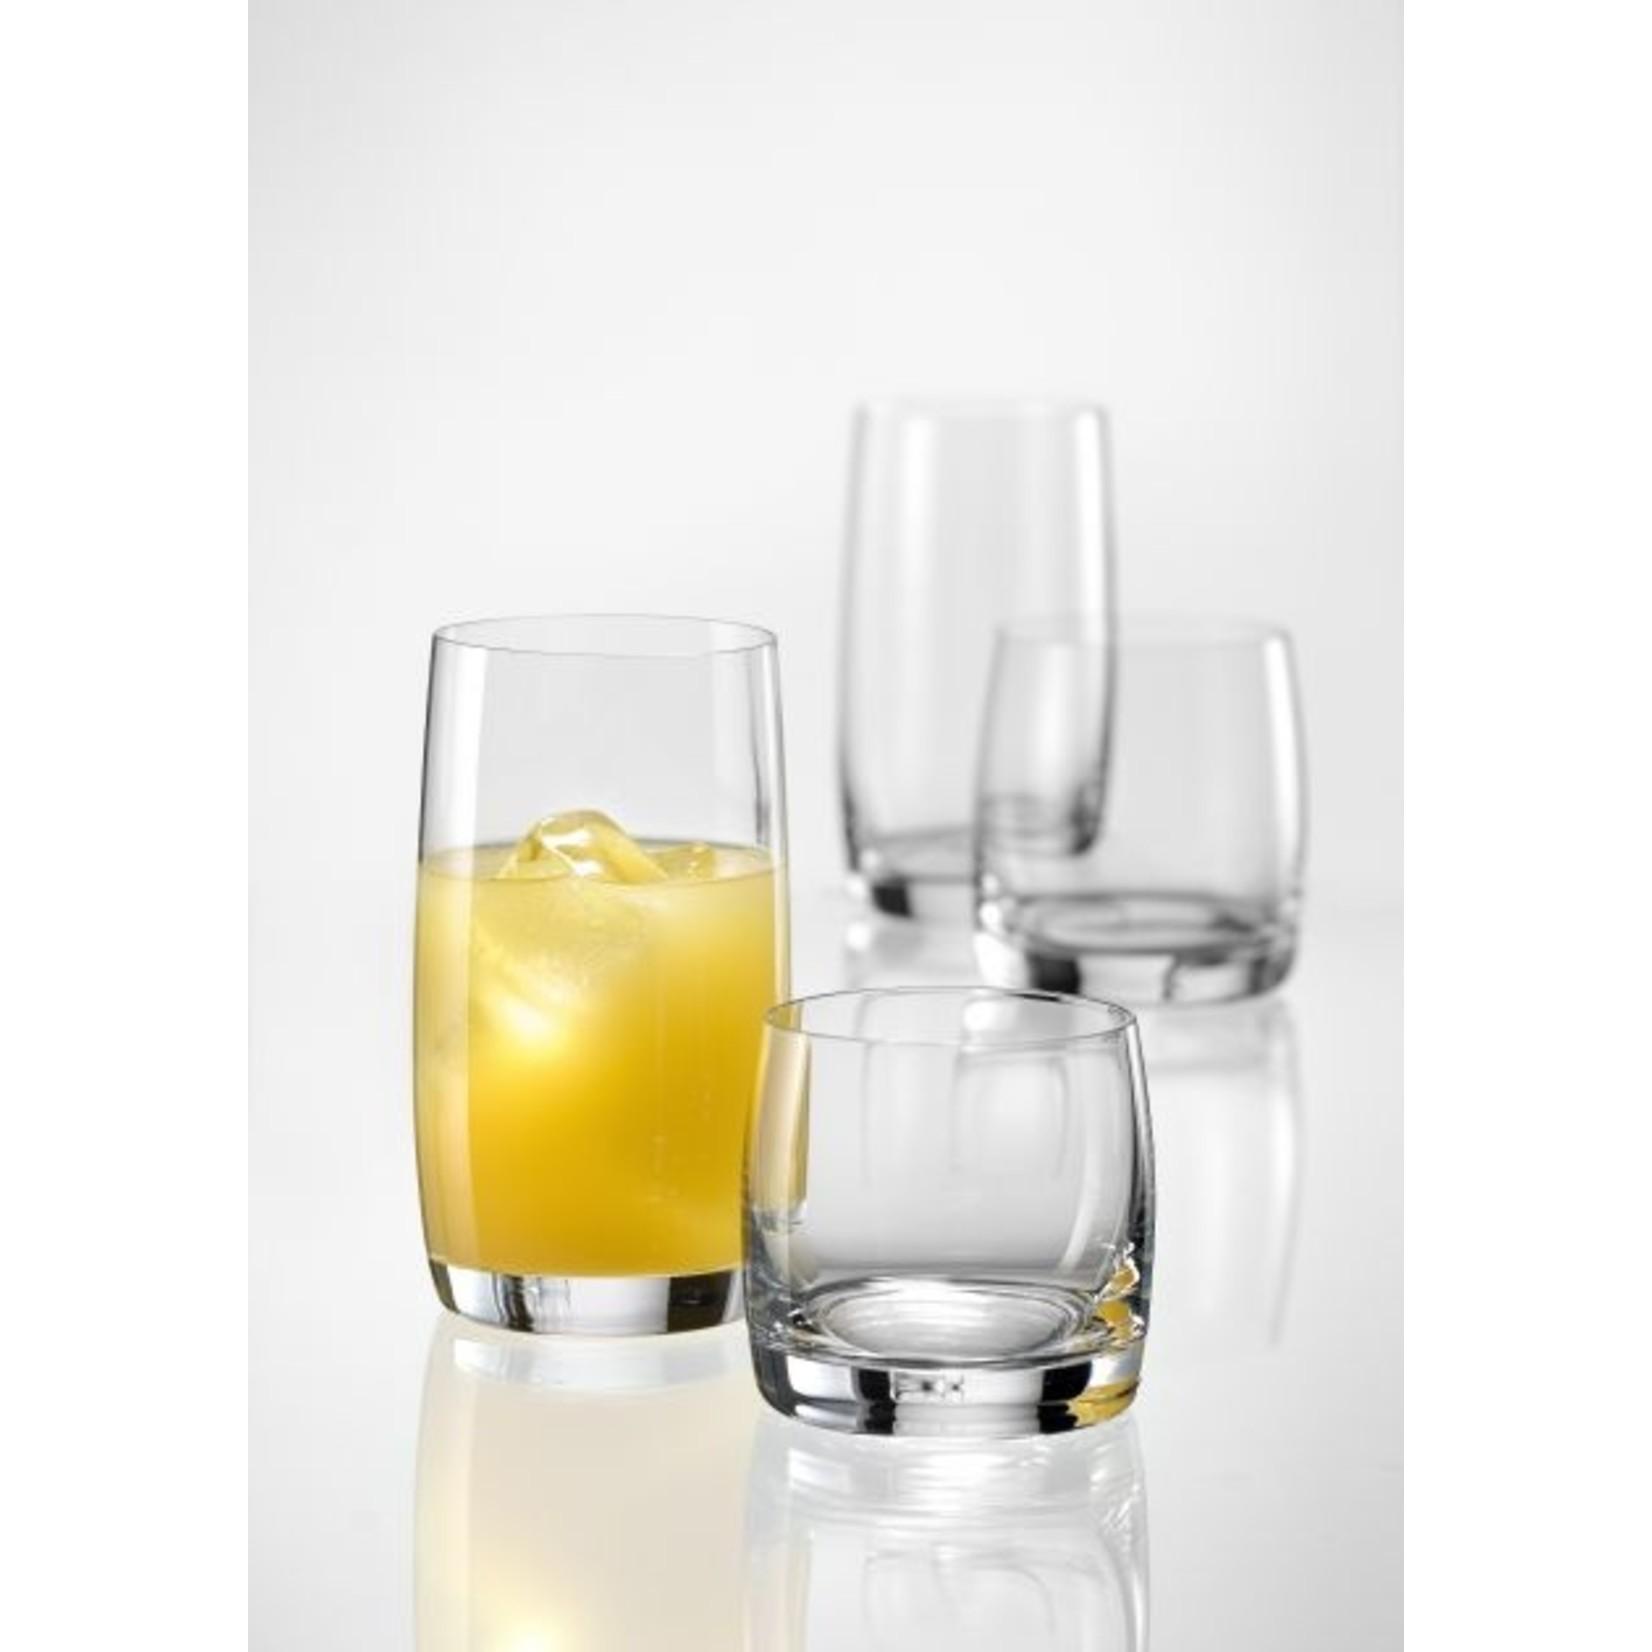 Crystalex Kristallen likeurglas Ideal 60 ml /6st